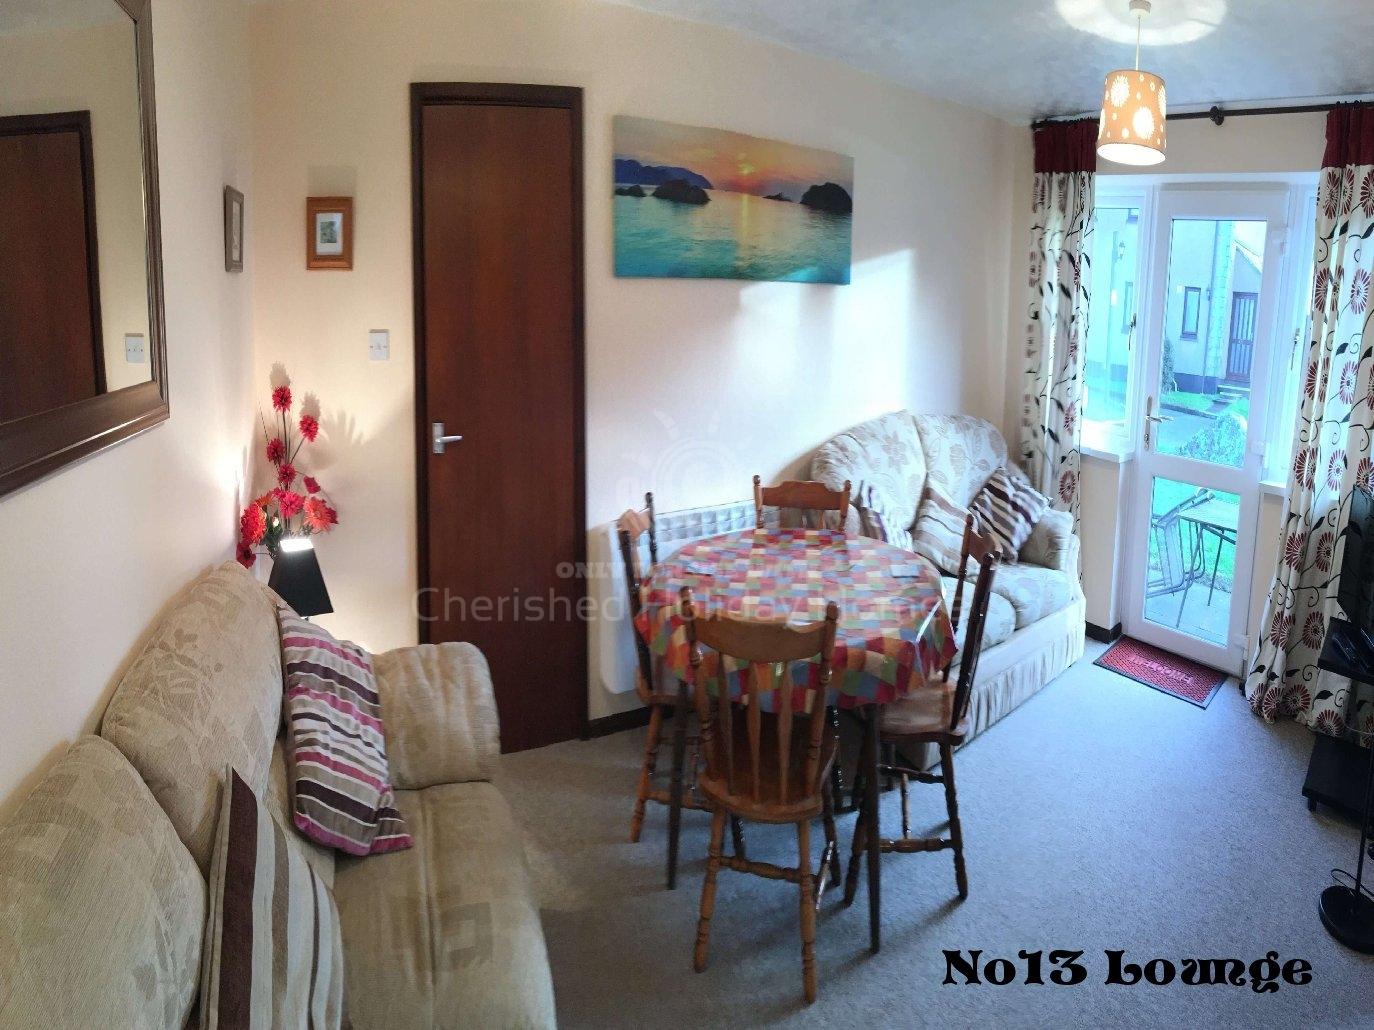 cottage at Cornish Cottage No13 Guval Penzance